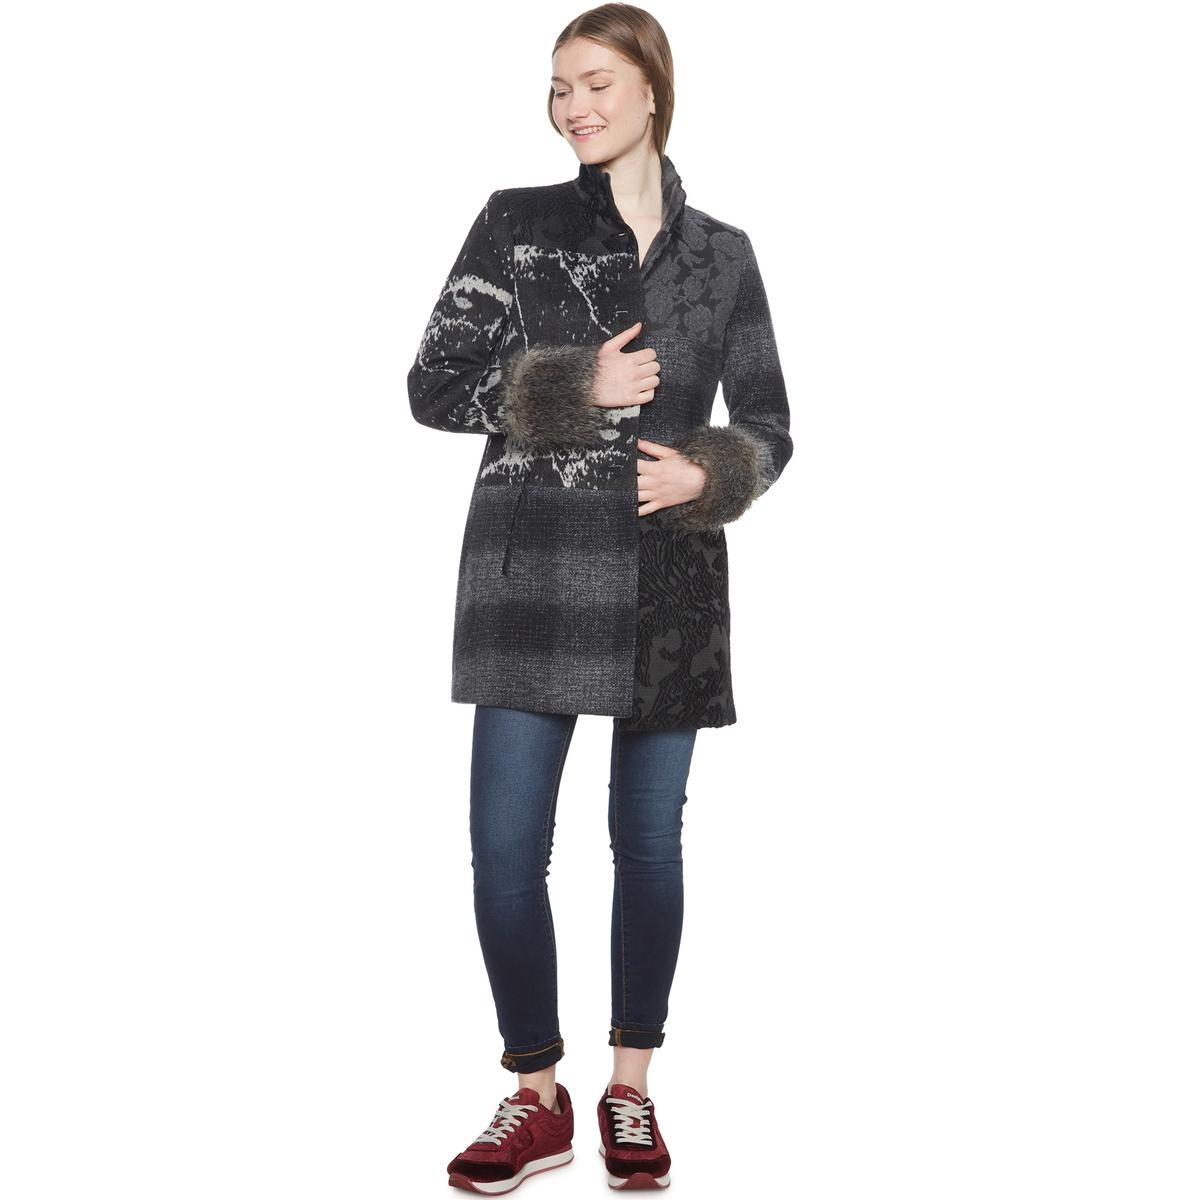 Abrigo semilargo estilo patchwork, de lana mezclada